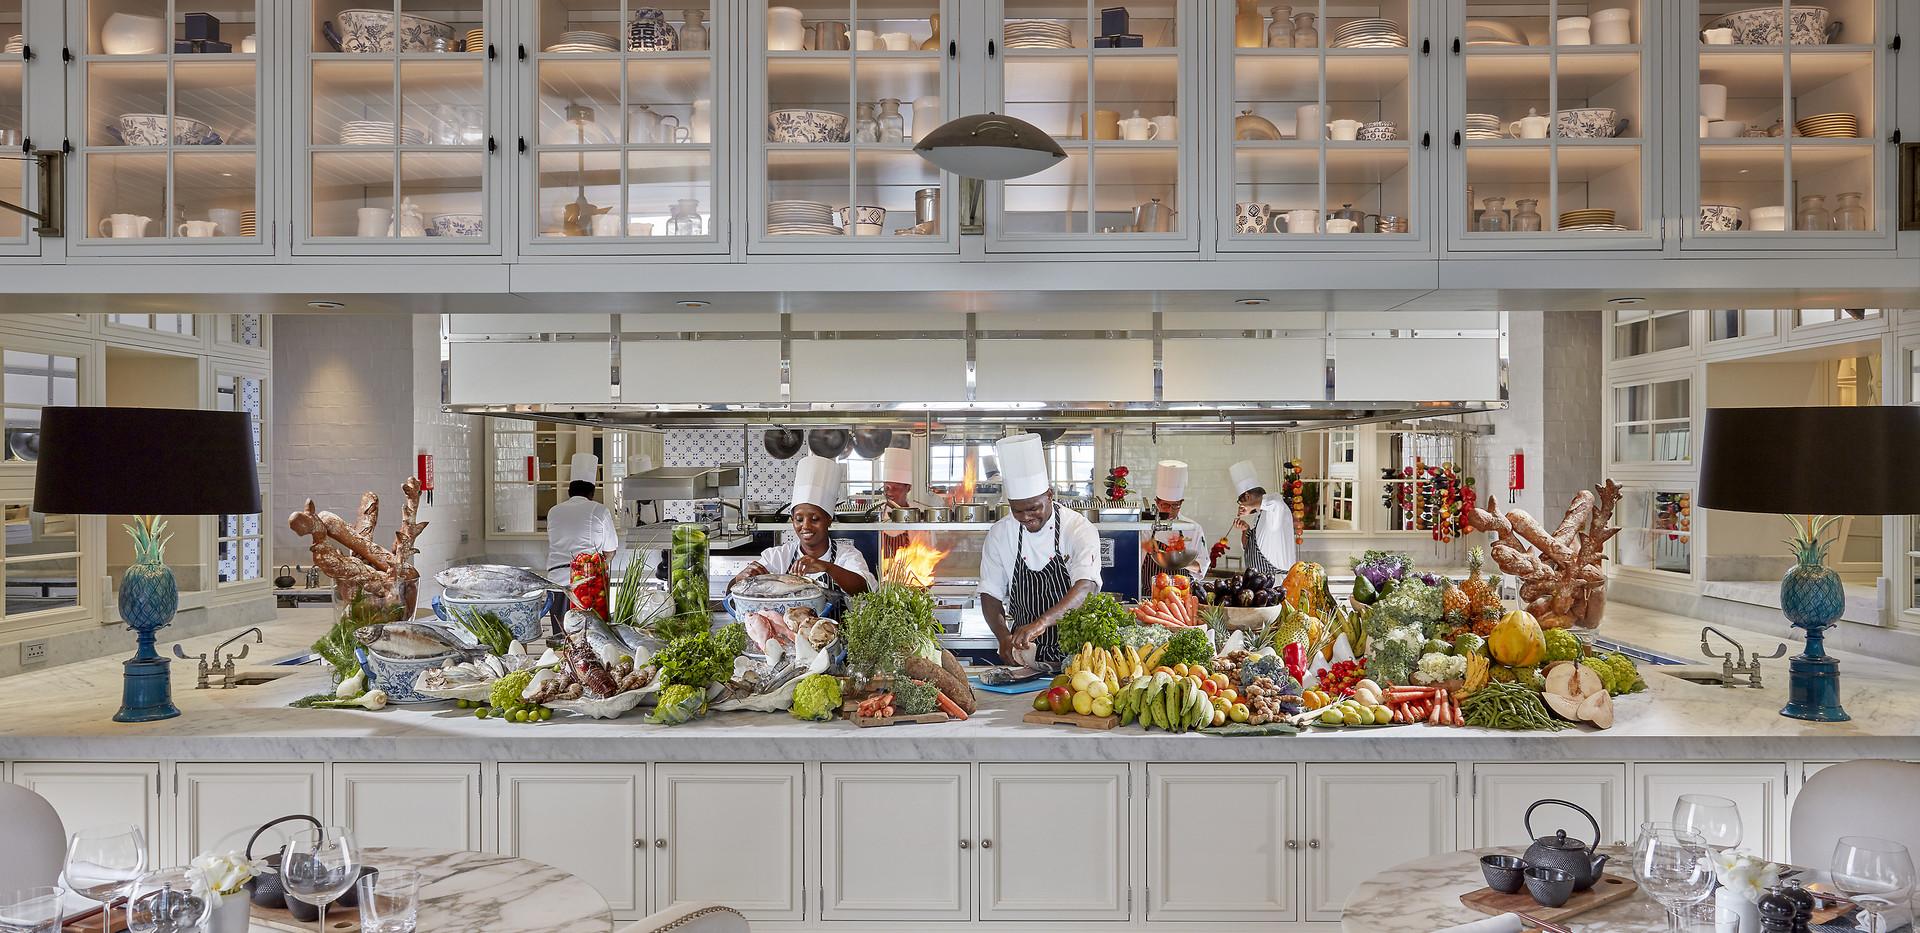 canouan-fine-dining-asianne-open-kitchen